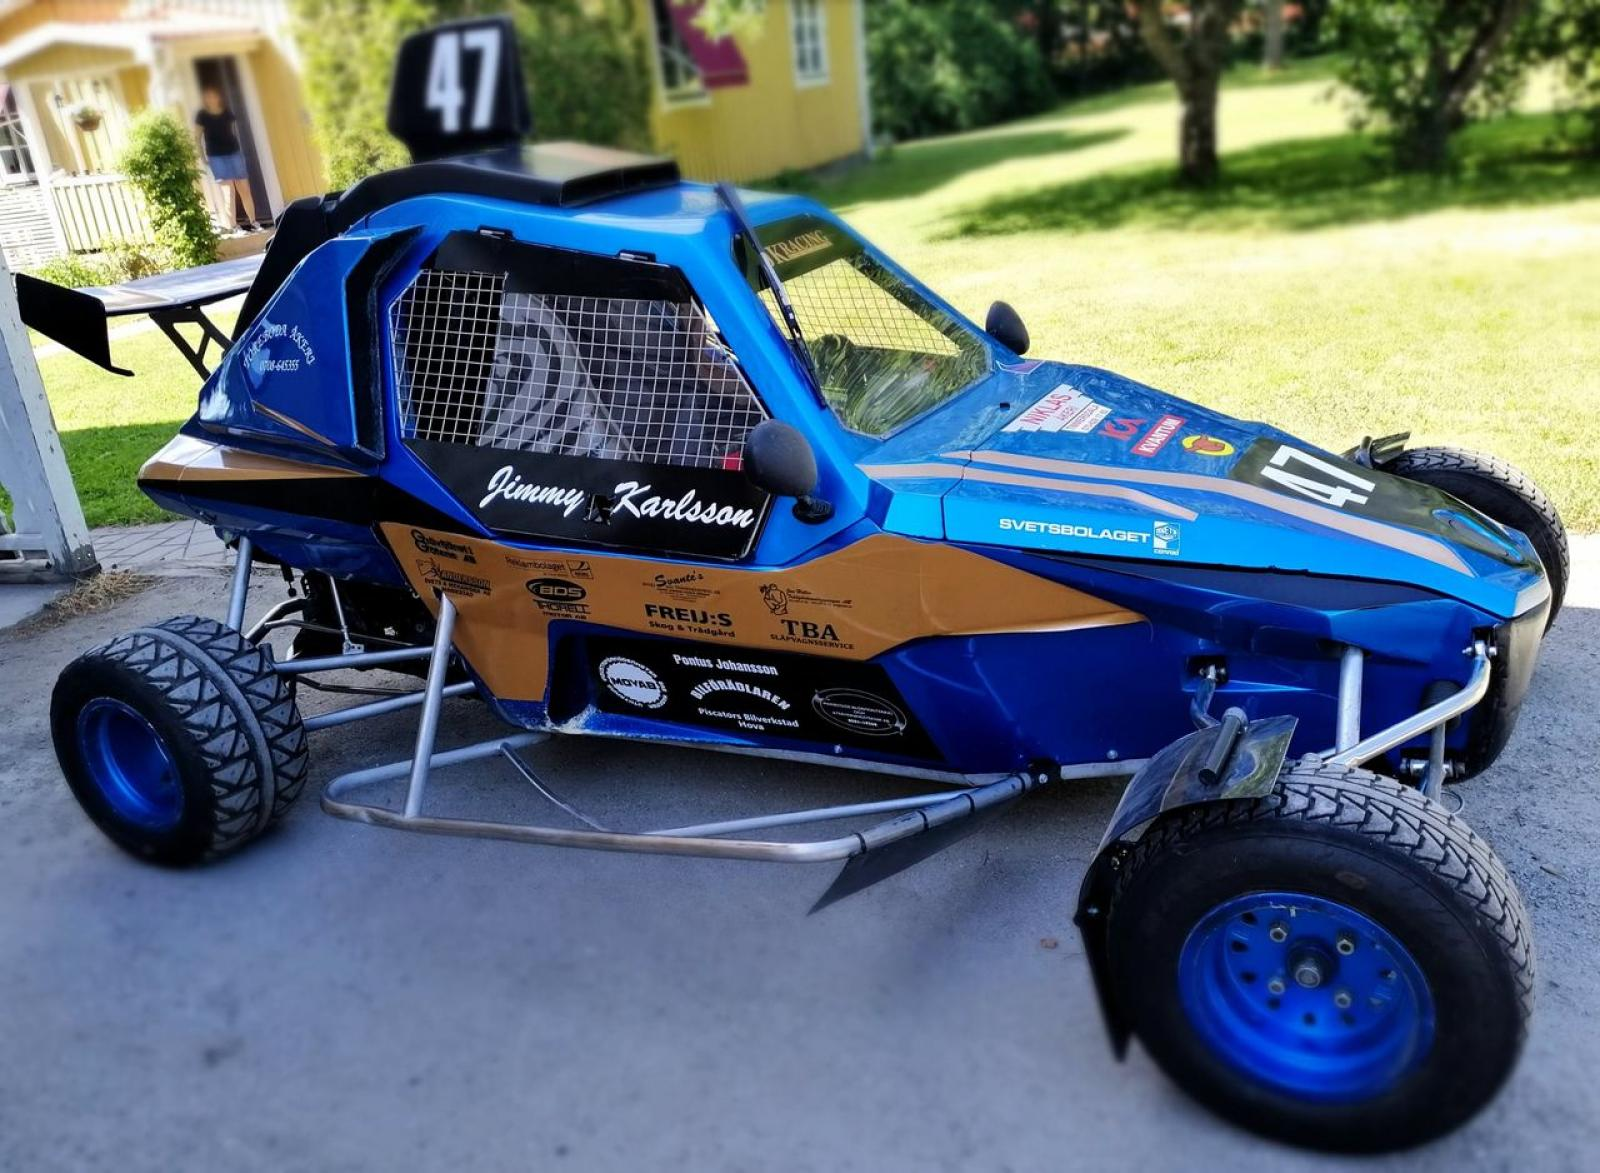 Crosskart Xtreme / Kartcross RX01 - 1